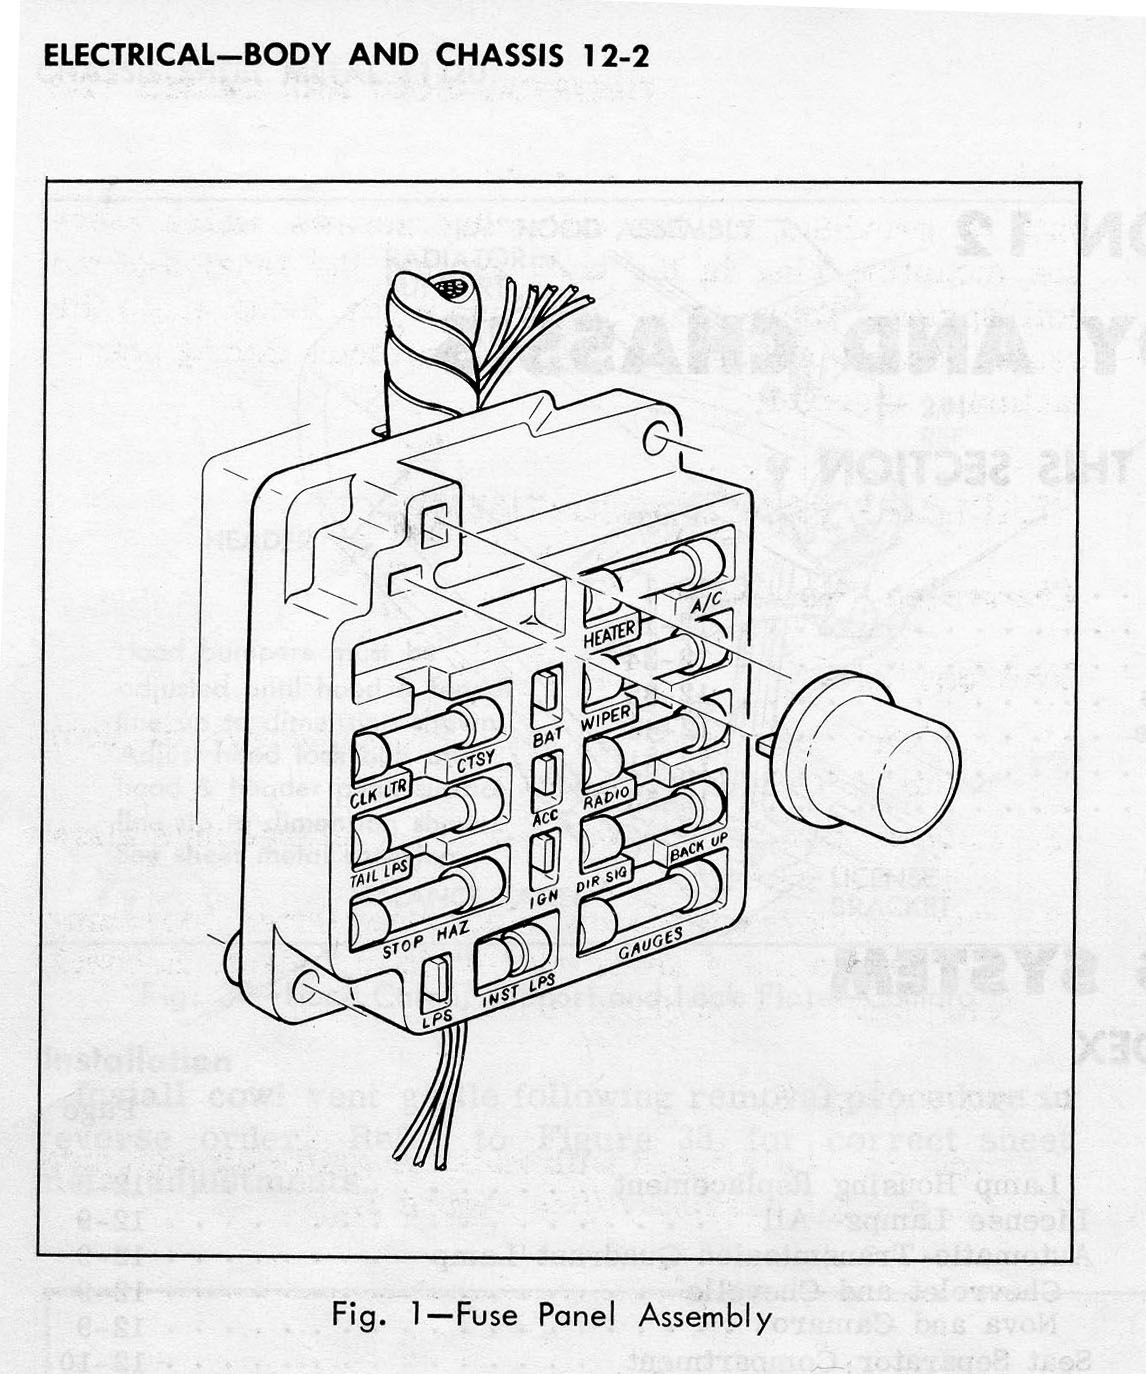 1969 corvette fuse box diagram - wiring ddiagrams home fold-analyst -  fold-analyst.brixiaproart.it  brixia pro art